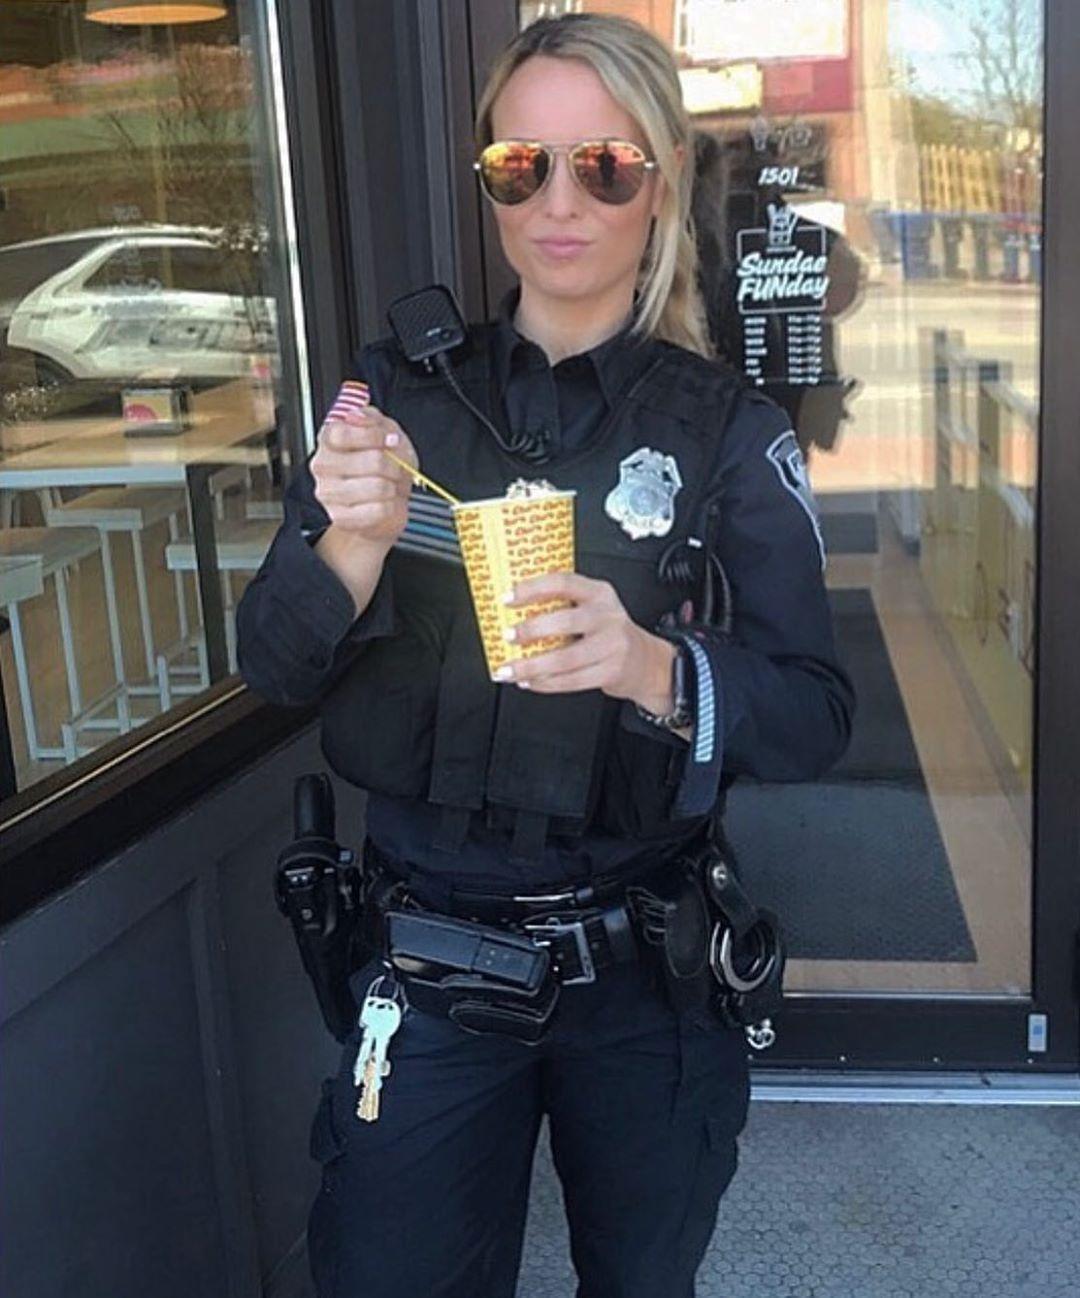 2 316 Kedveles 40 Hozzaszolas Thinbluelinesfinest Thinbluelinesfinest Instagram Hozzaszolasa Lono Police Women Female Police Officers Thin Blue Lines